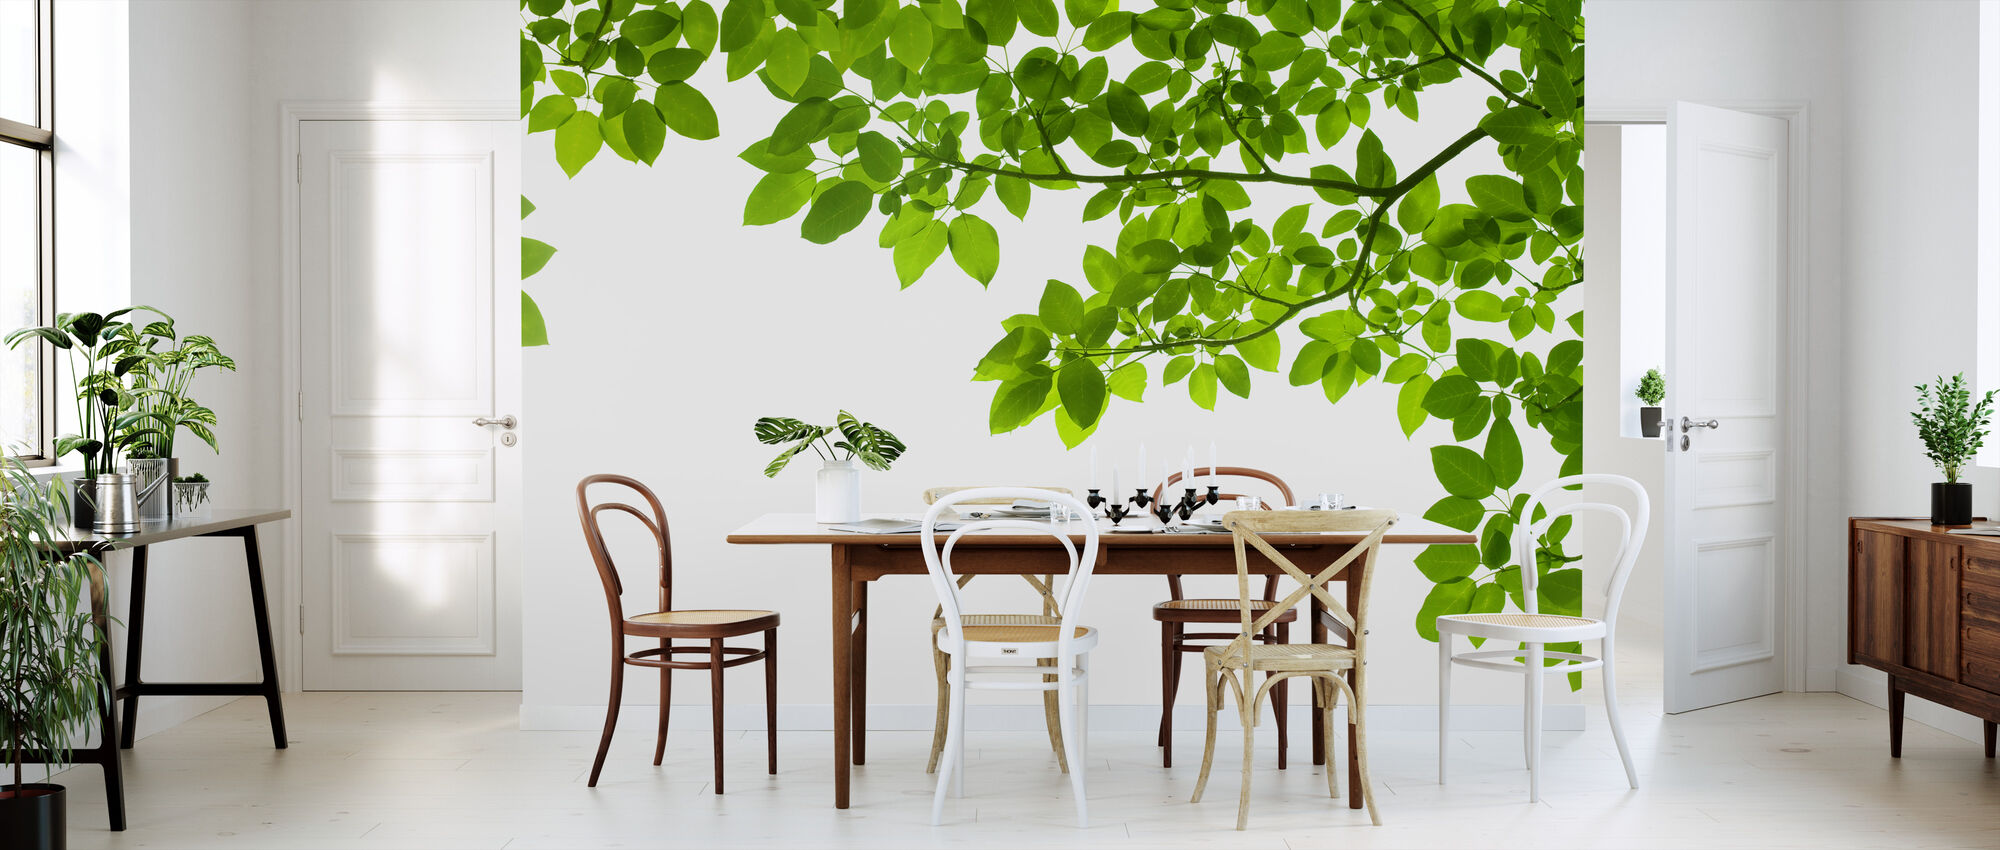 Frame of Leaves - Wallpaper - Kitchen